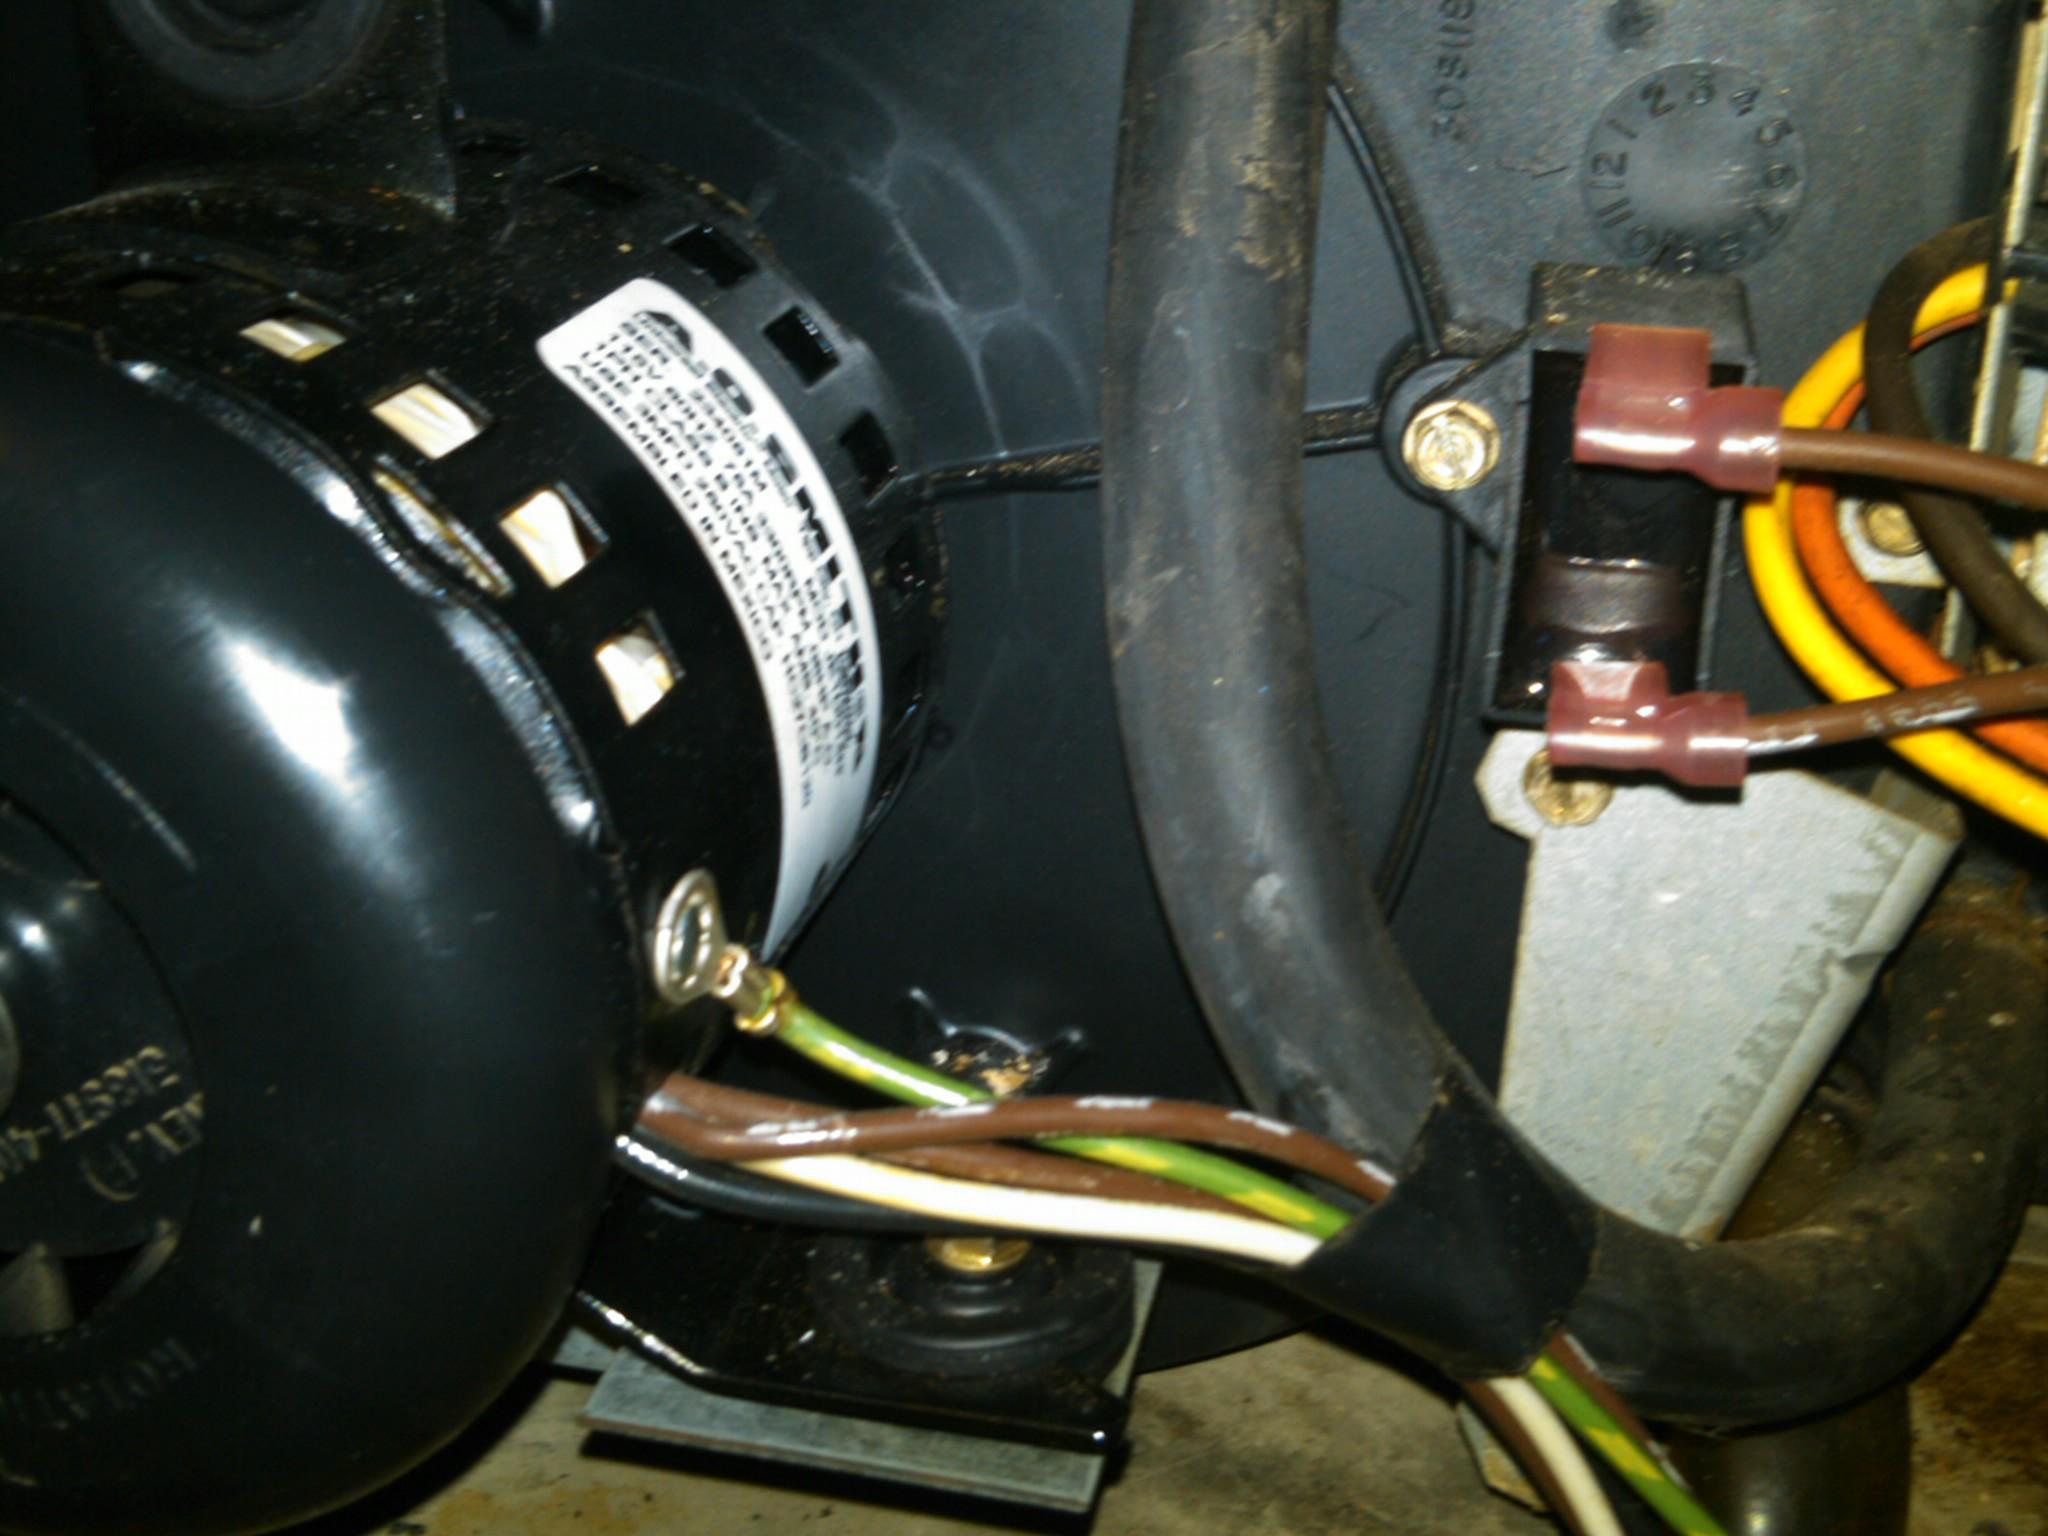 I have a Carrier 58SXA Weathermaker furnace. Last week it ... Gas Wiring Carrier Diagram Furnace Sxa Jg on